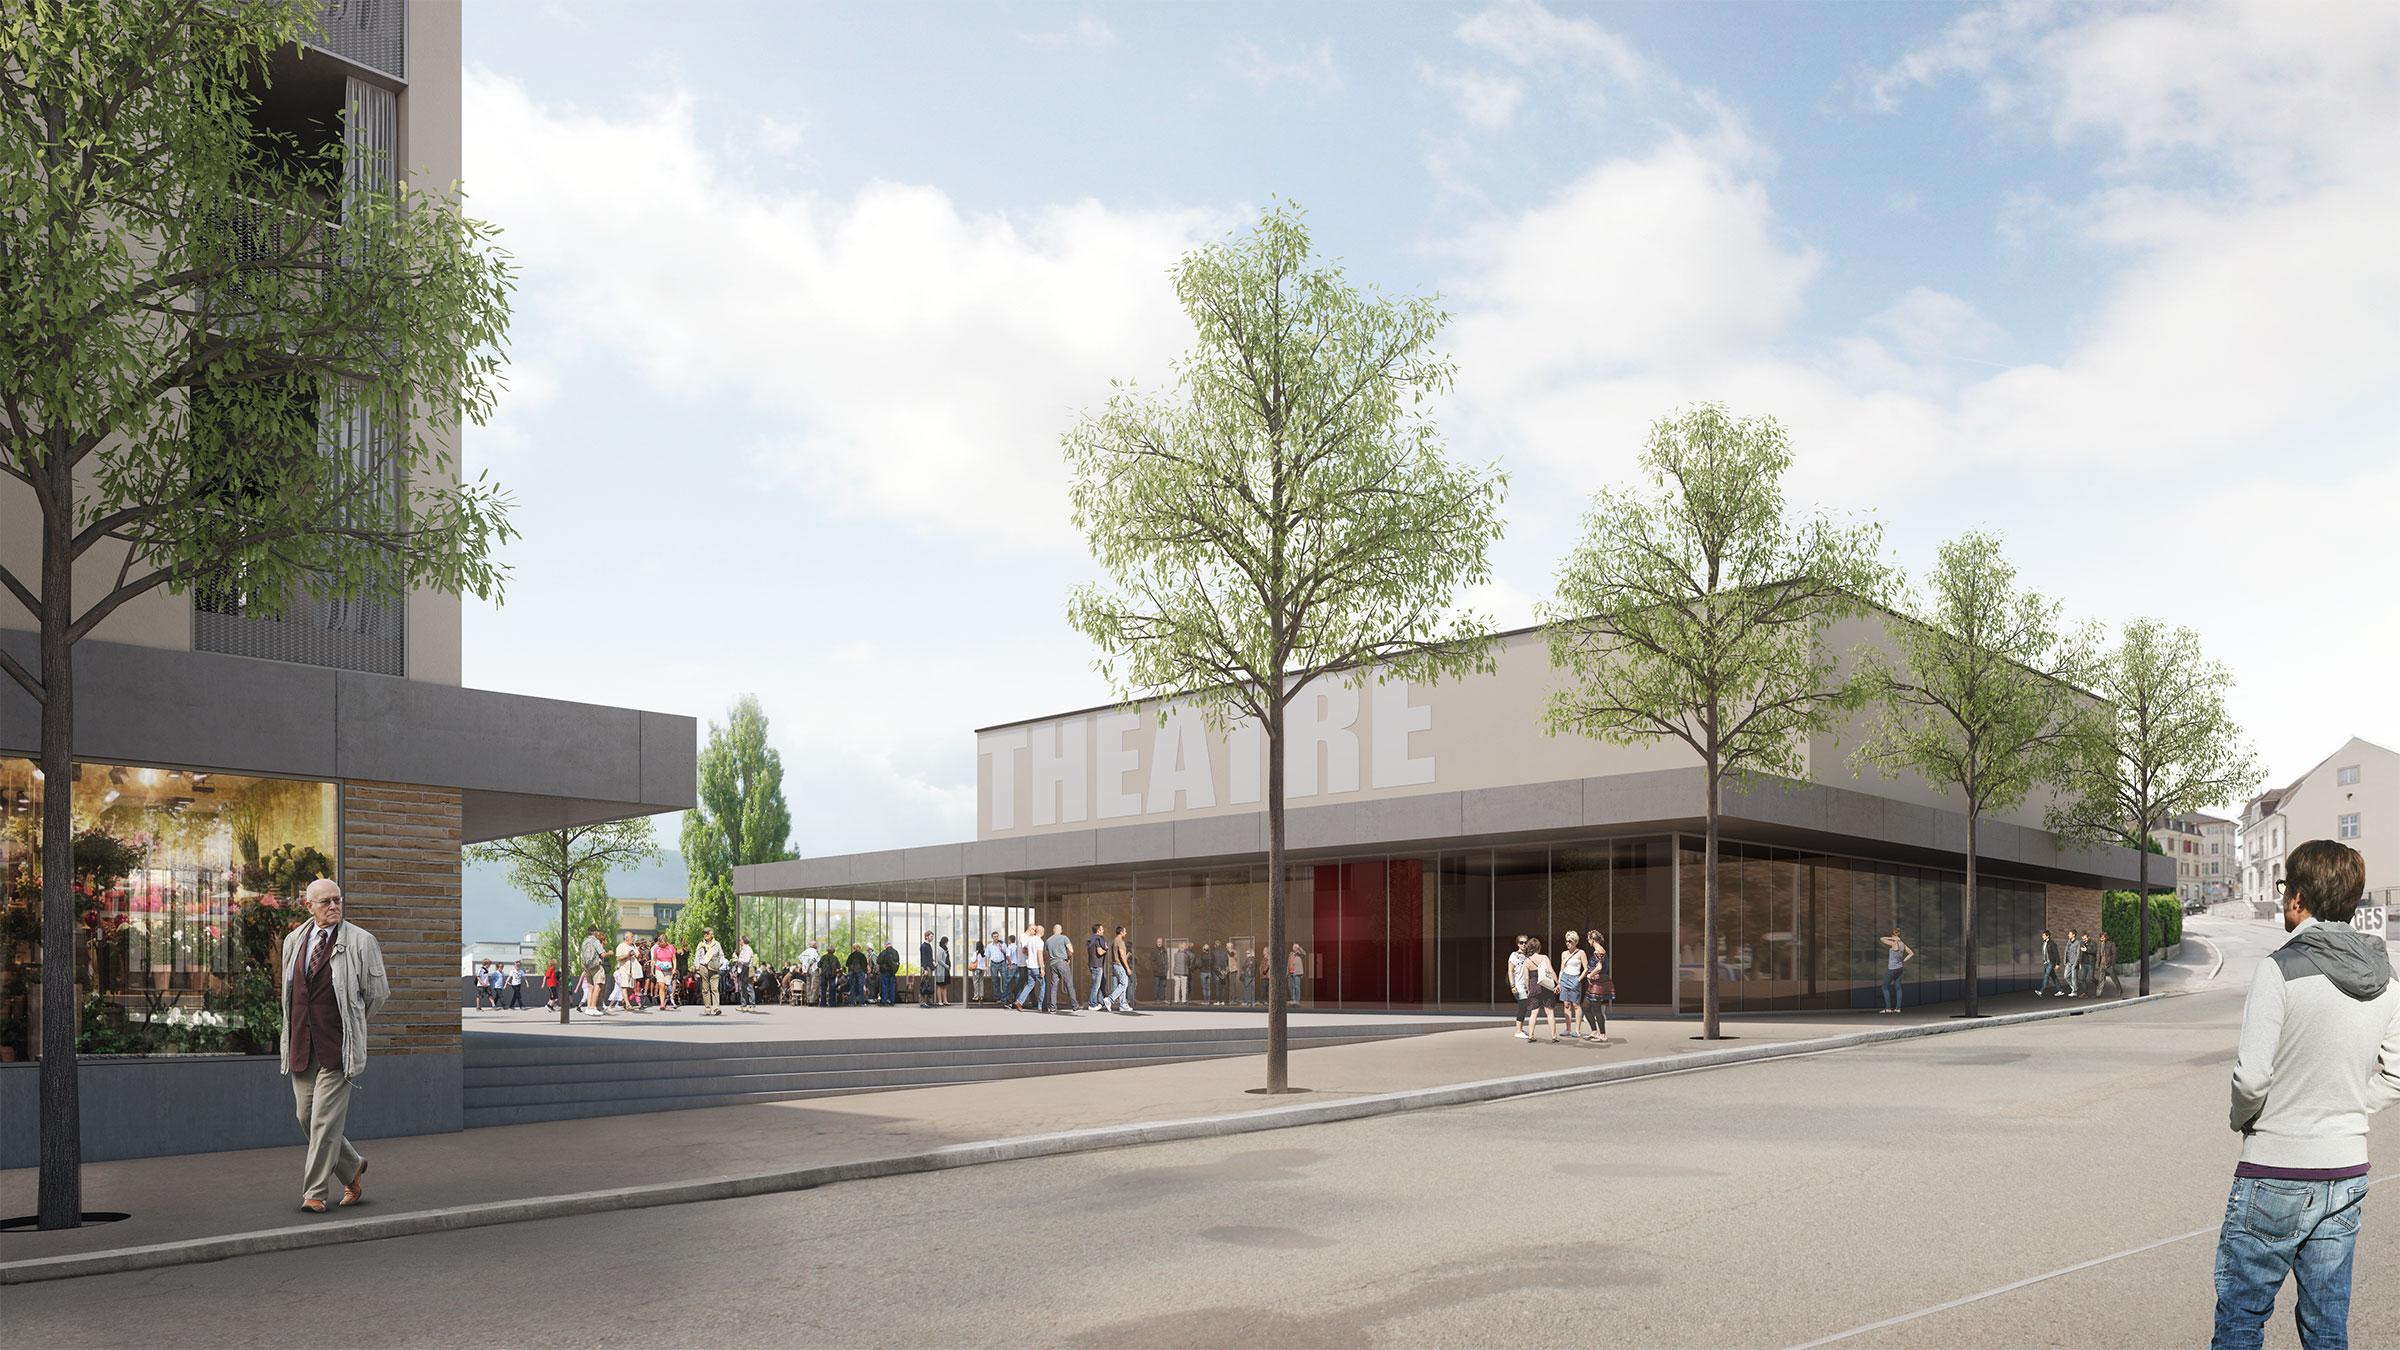 Zentrumsüberbauung mit dem Théâtre du Jura Delémont